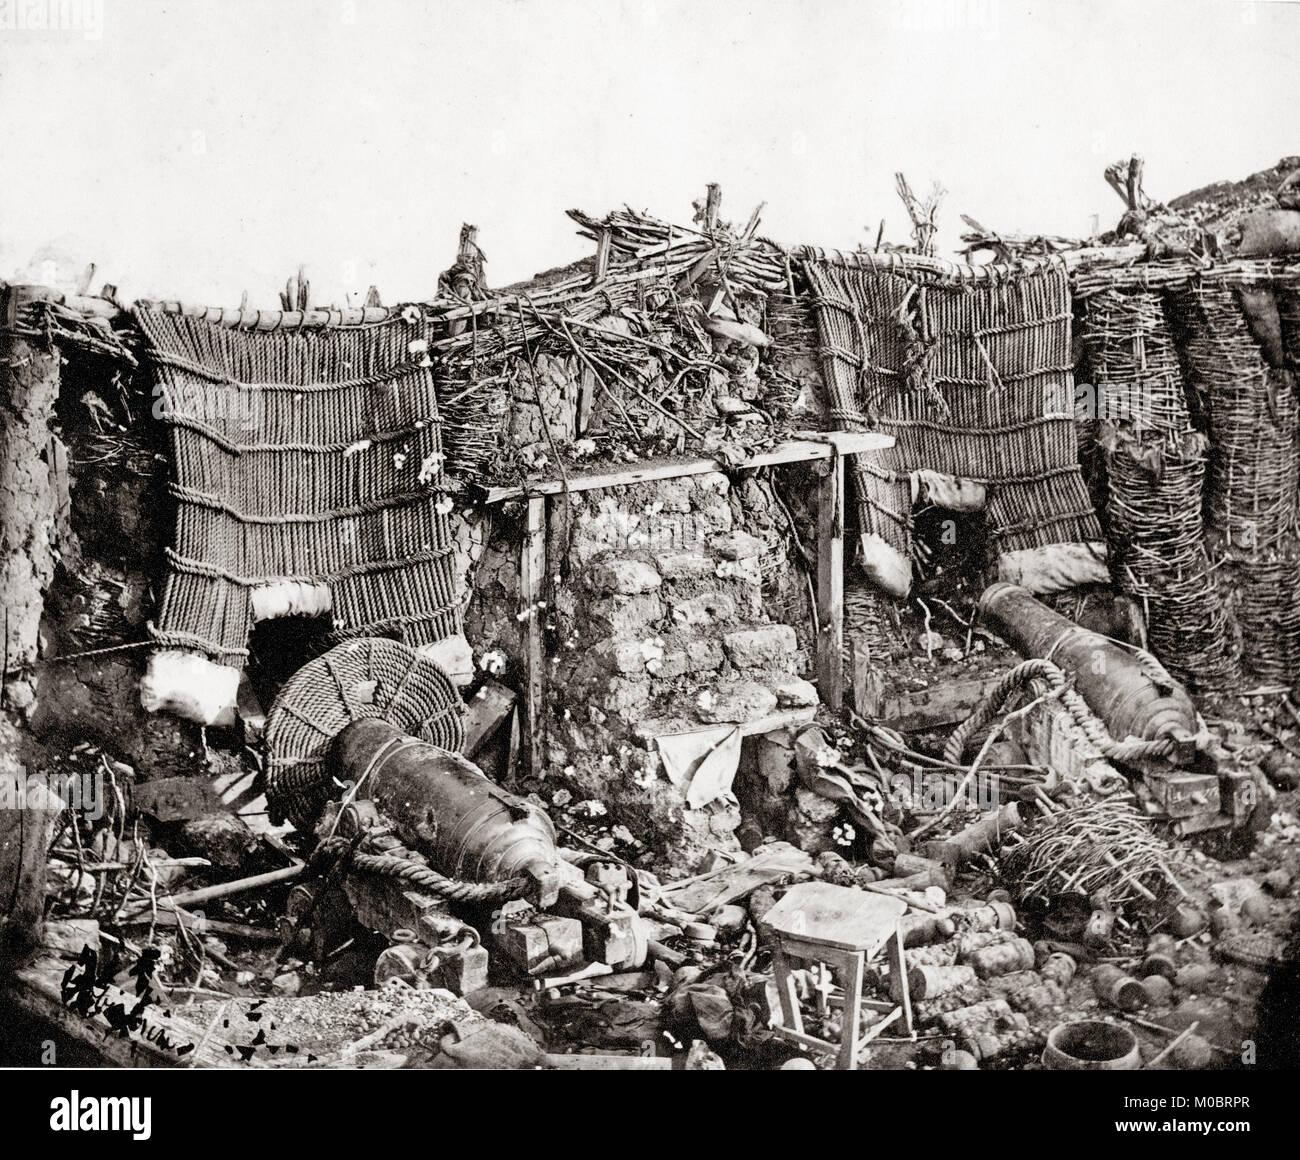 James Robertson, (1813 — 1888) Crimean War, inside the Barrack Battery, September 1855 - Stock Image